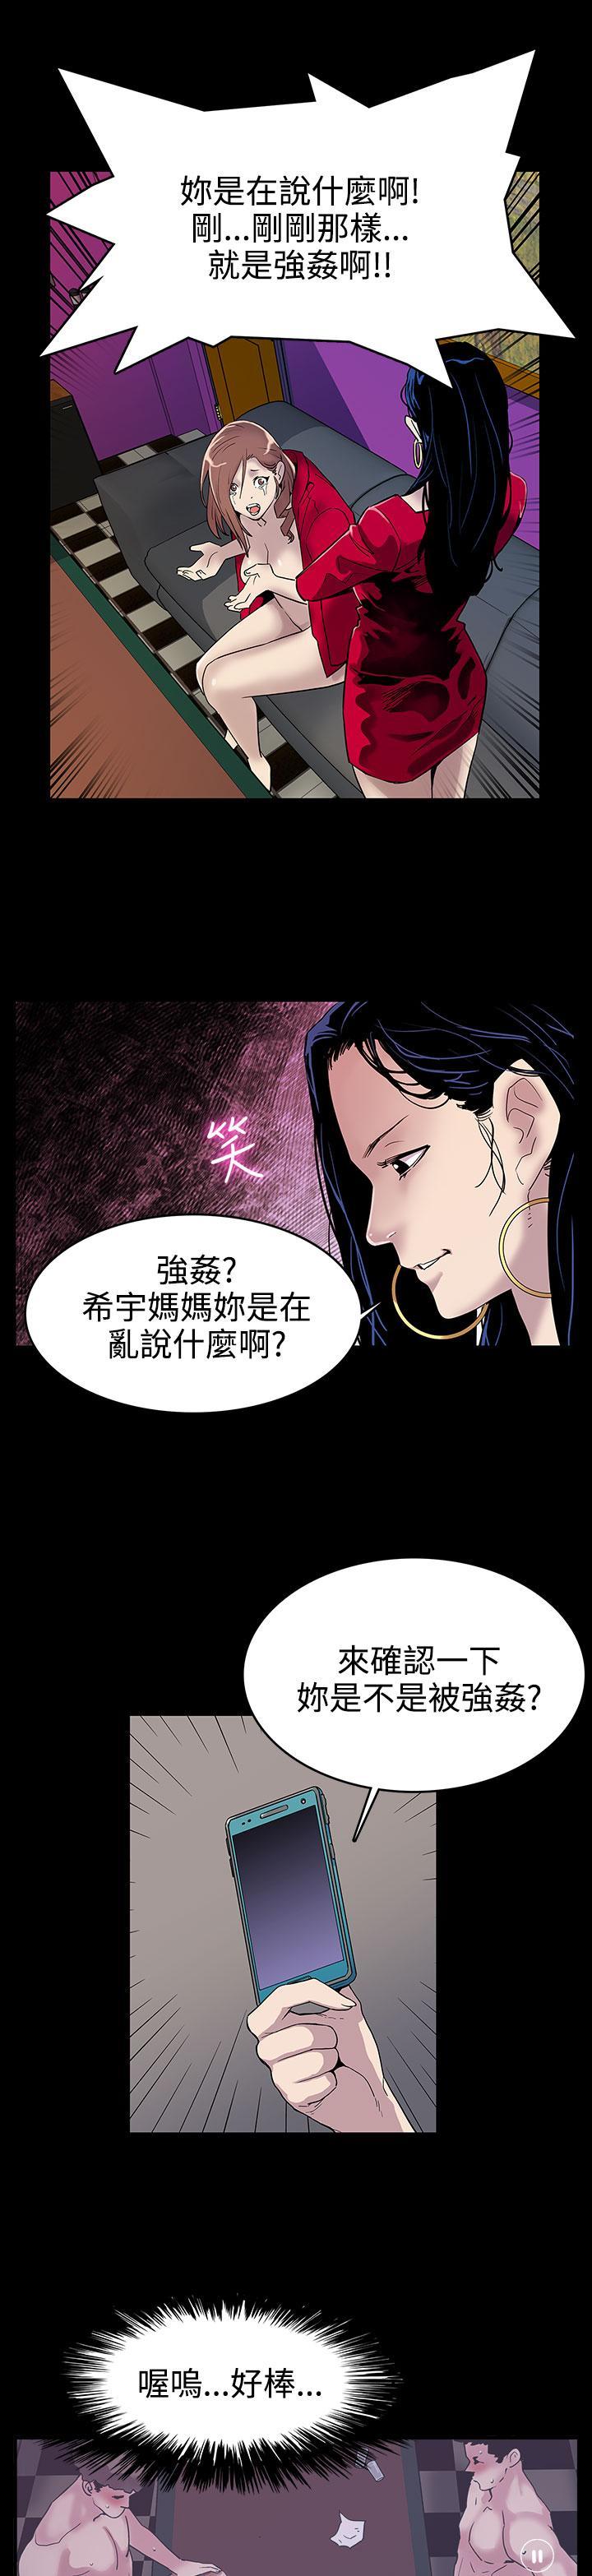 Mom cafe 第1話 [Chinese]中文 24